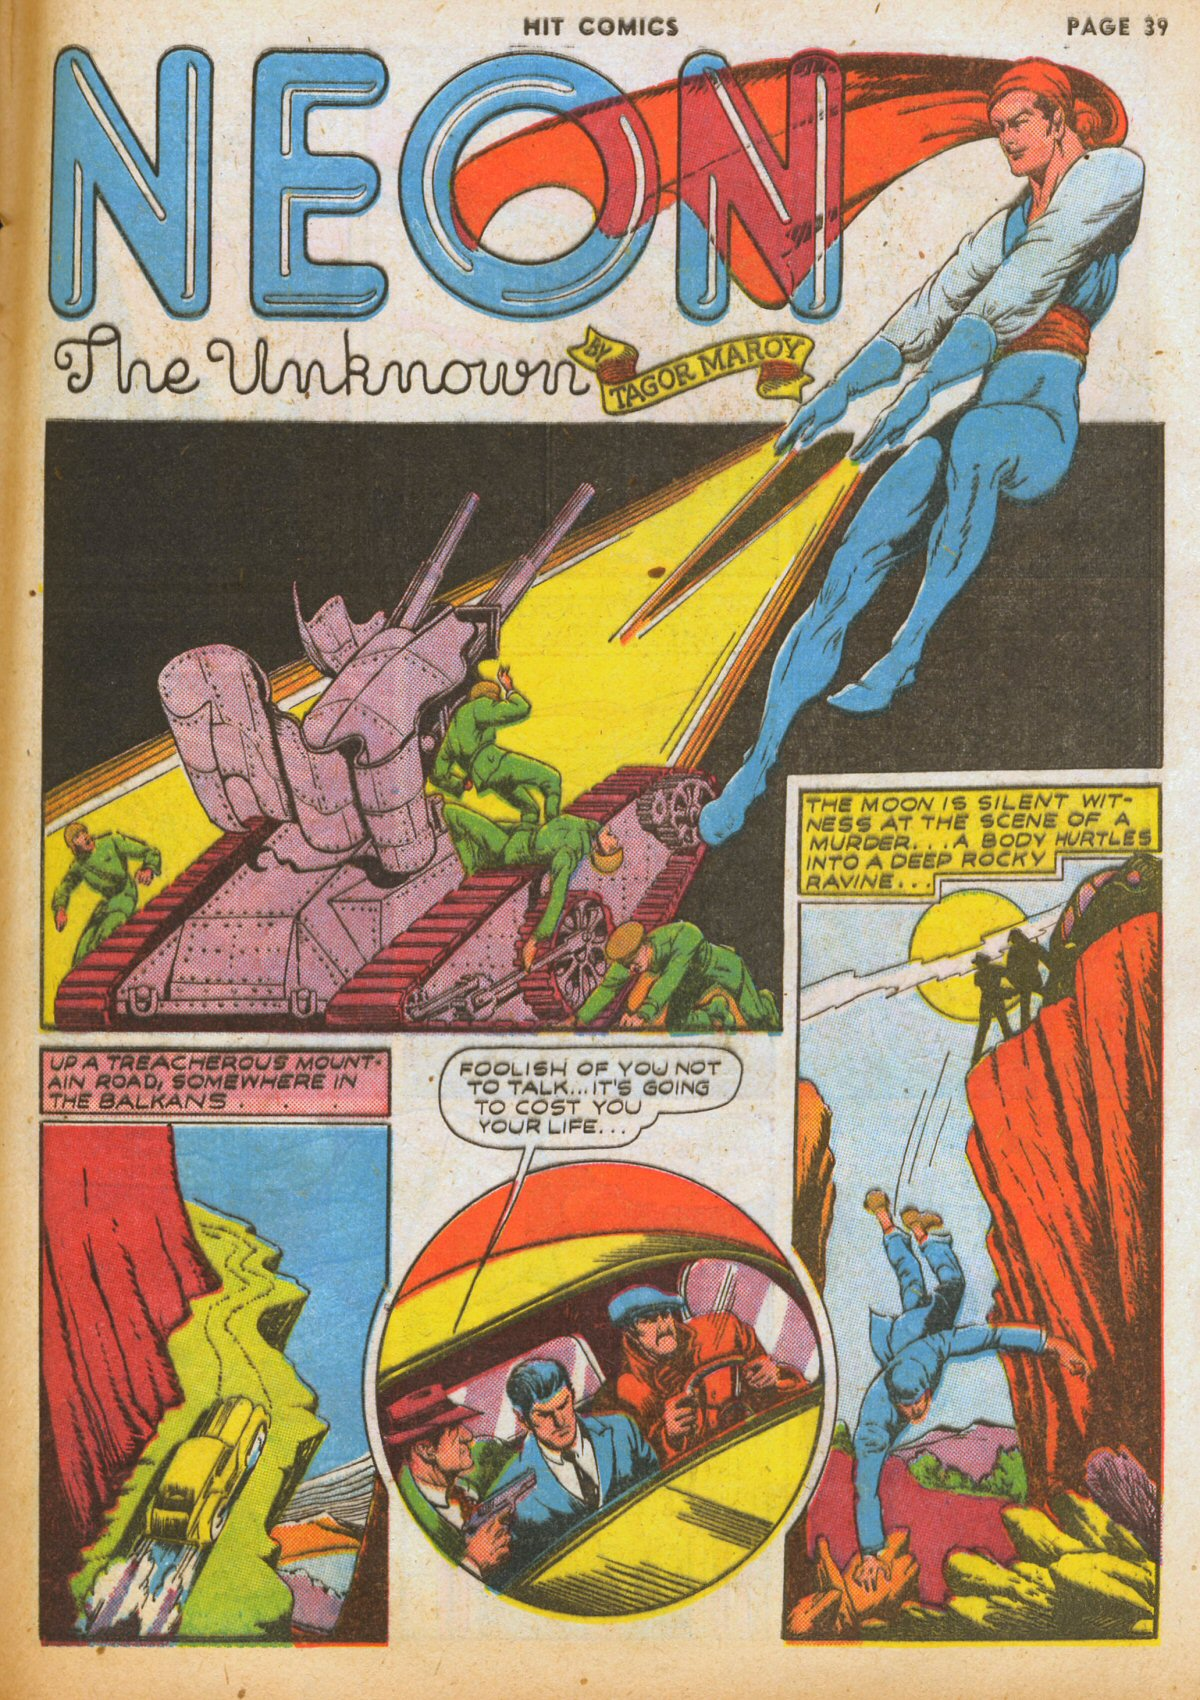 Read online Hit Comics comic -  Issue #12 - 41